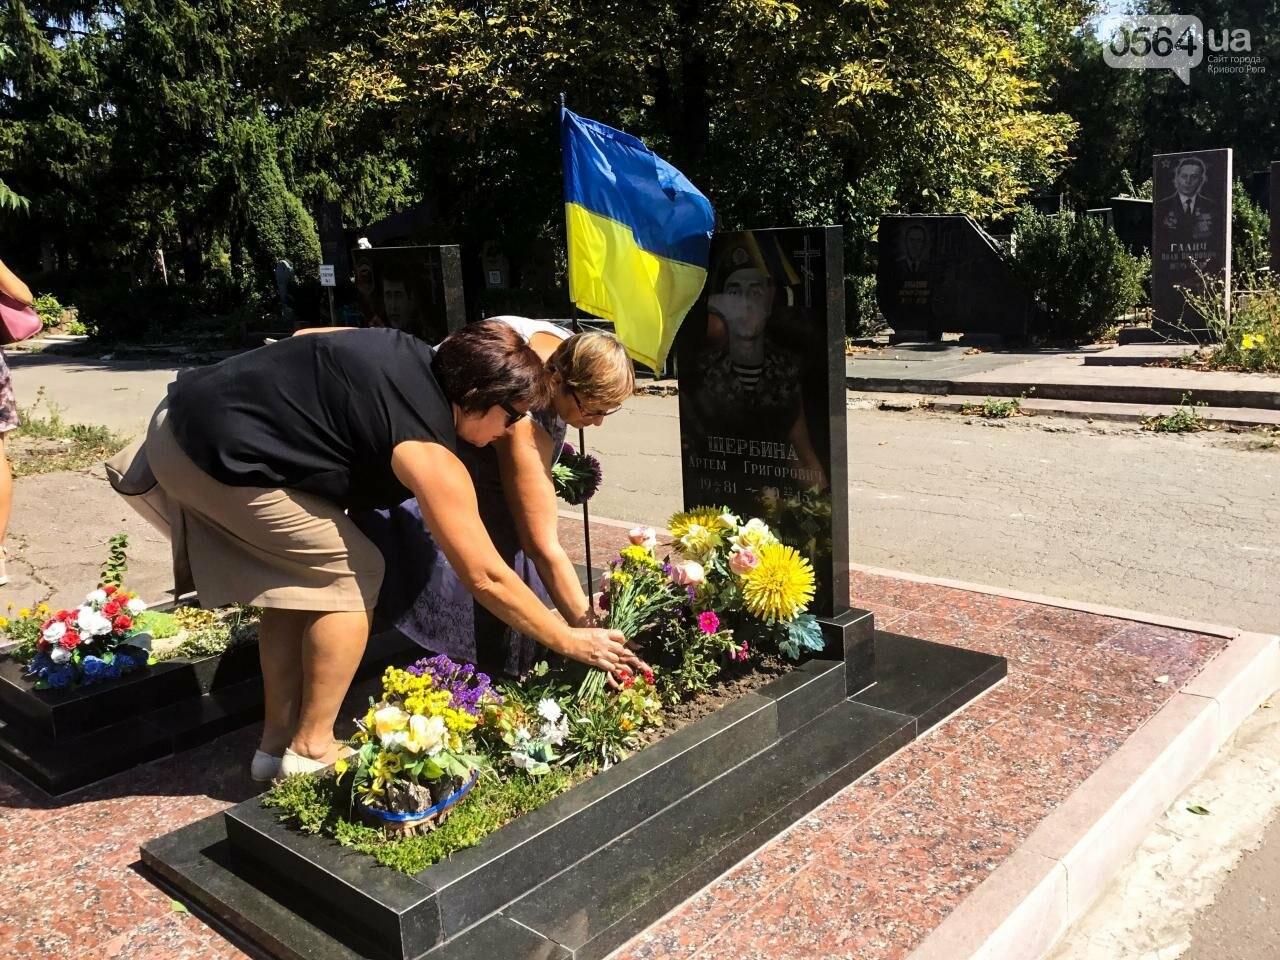 На Аллее Героев провели панихиду по погибшим в зоне АТО криворожанам, - ФОТО , фото-31